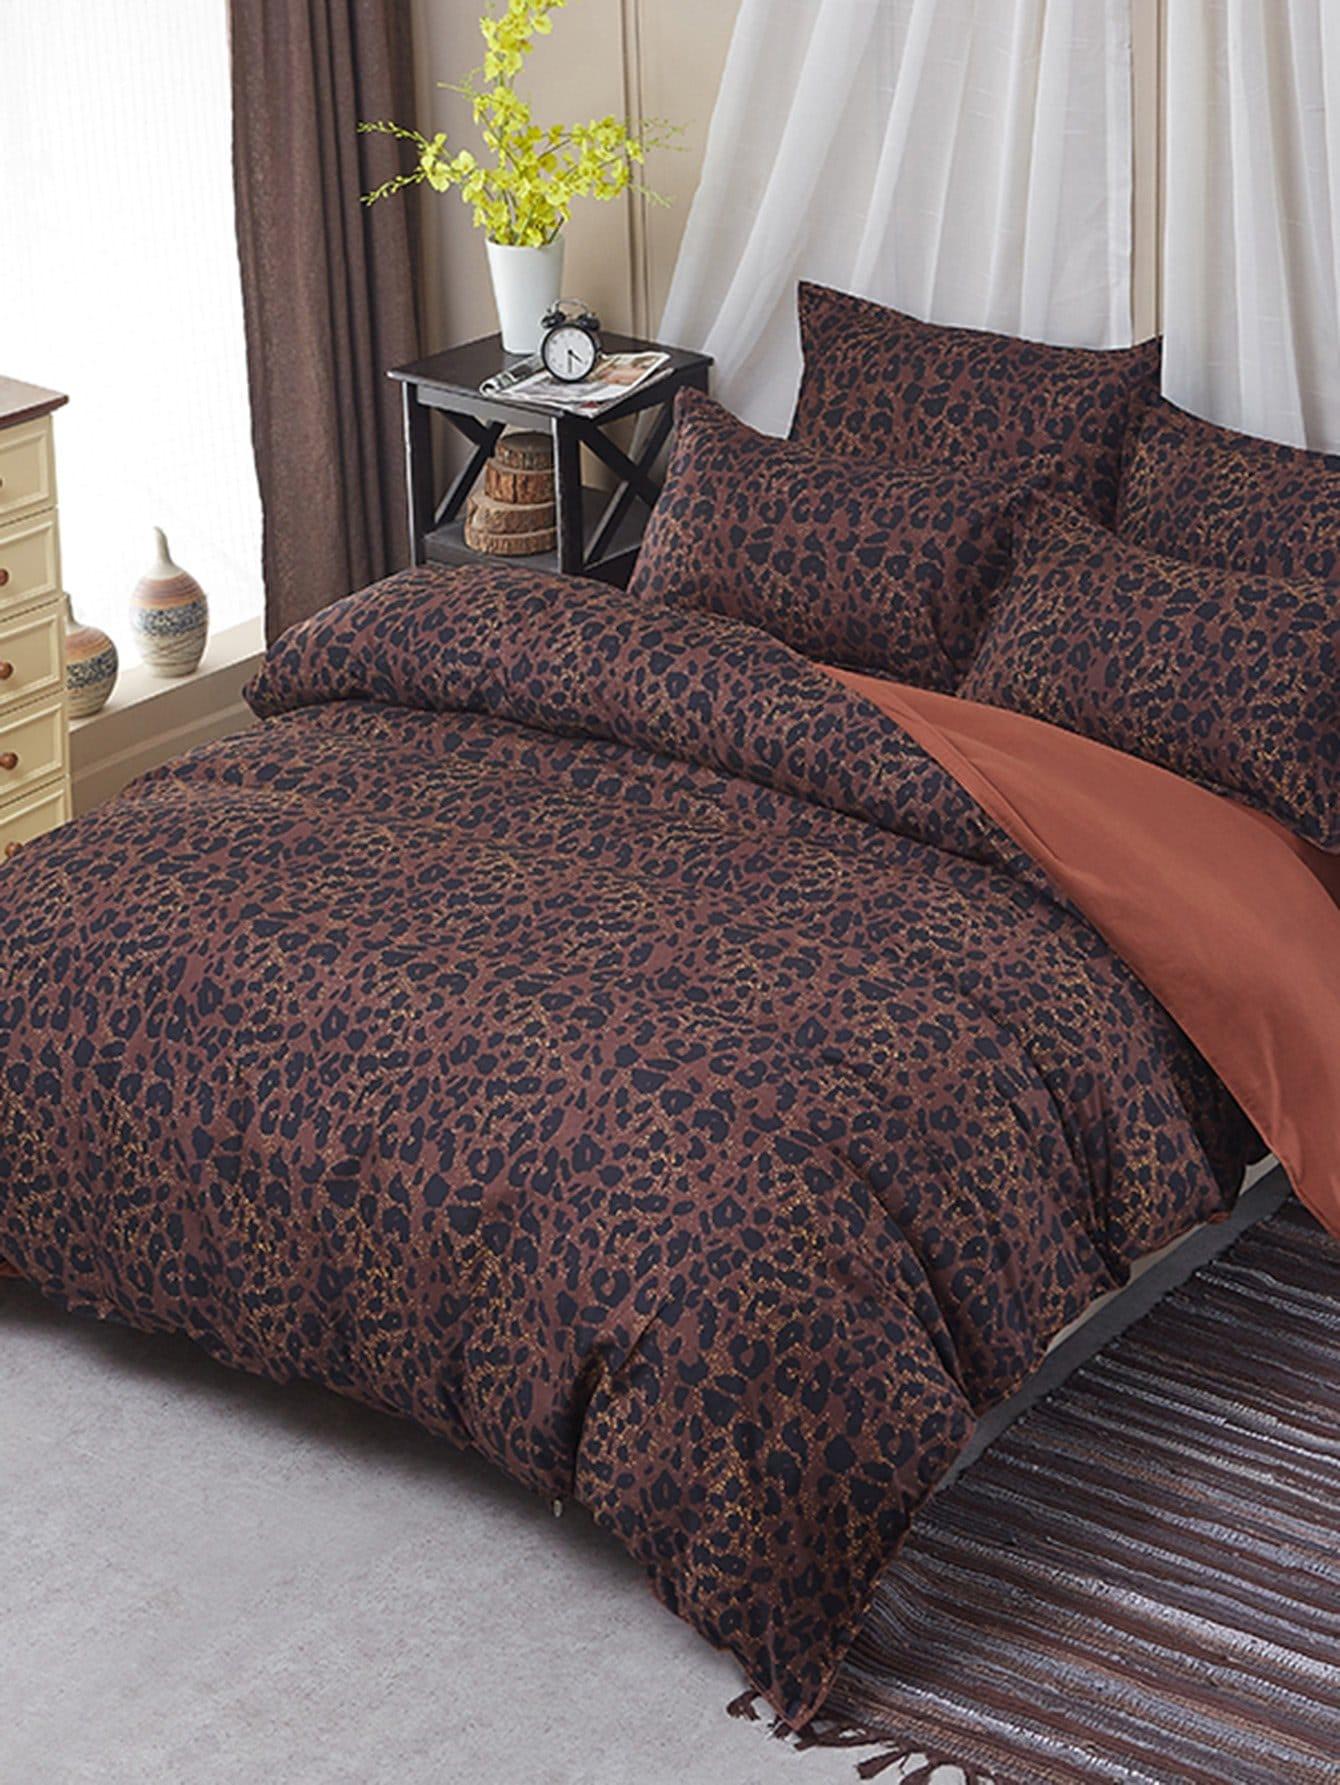 Leopard Print Duvet Cover Set